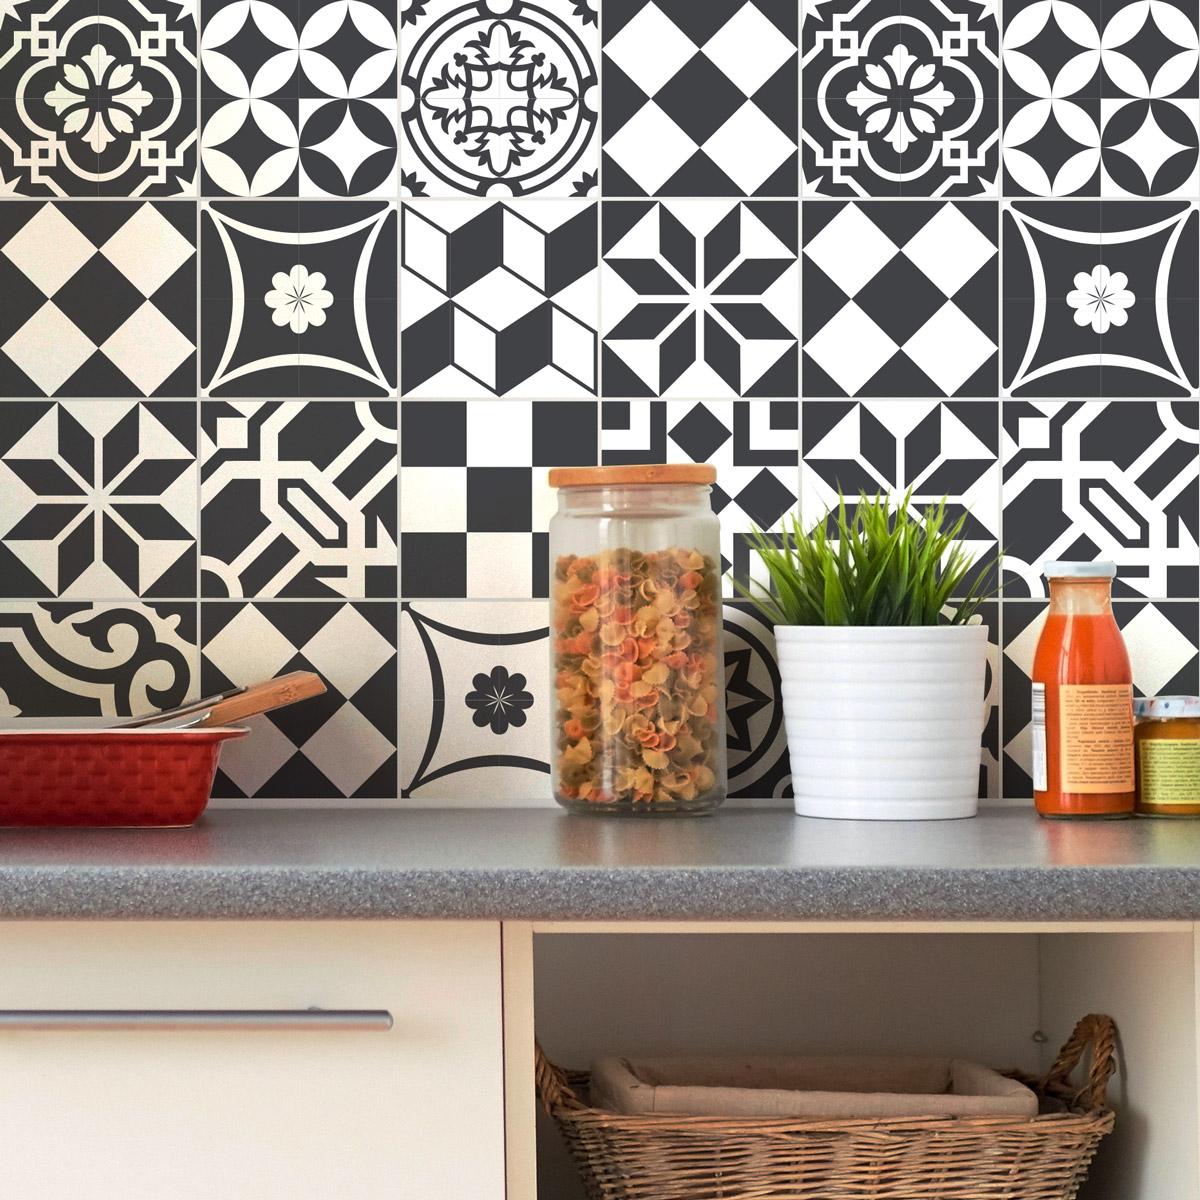 24 stickers carrelages azulejos ornements chic art et design artistiques ambiance sticker. Black Bedroom Furniture Sets. Home Design Ideas